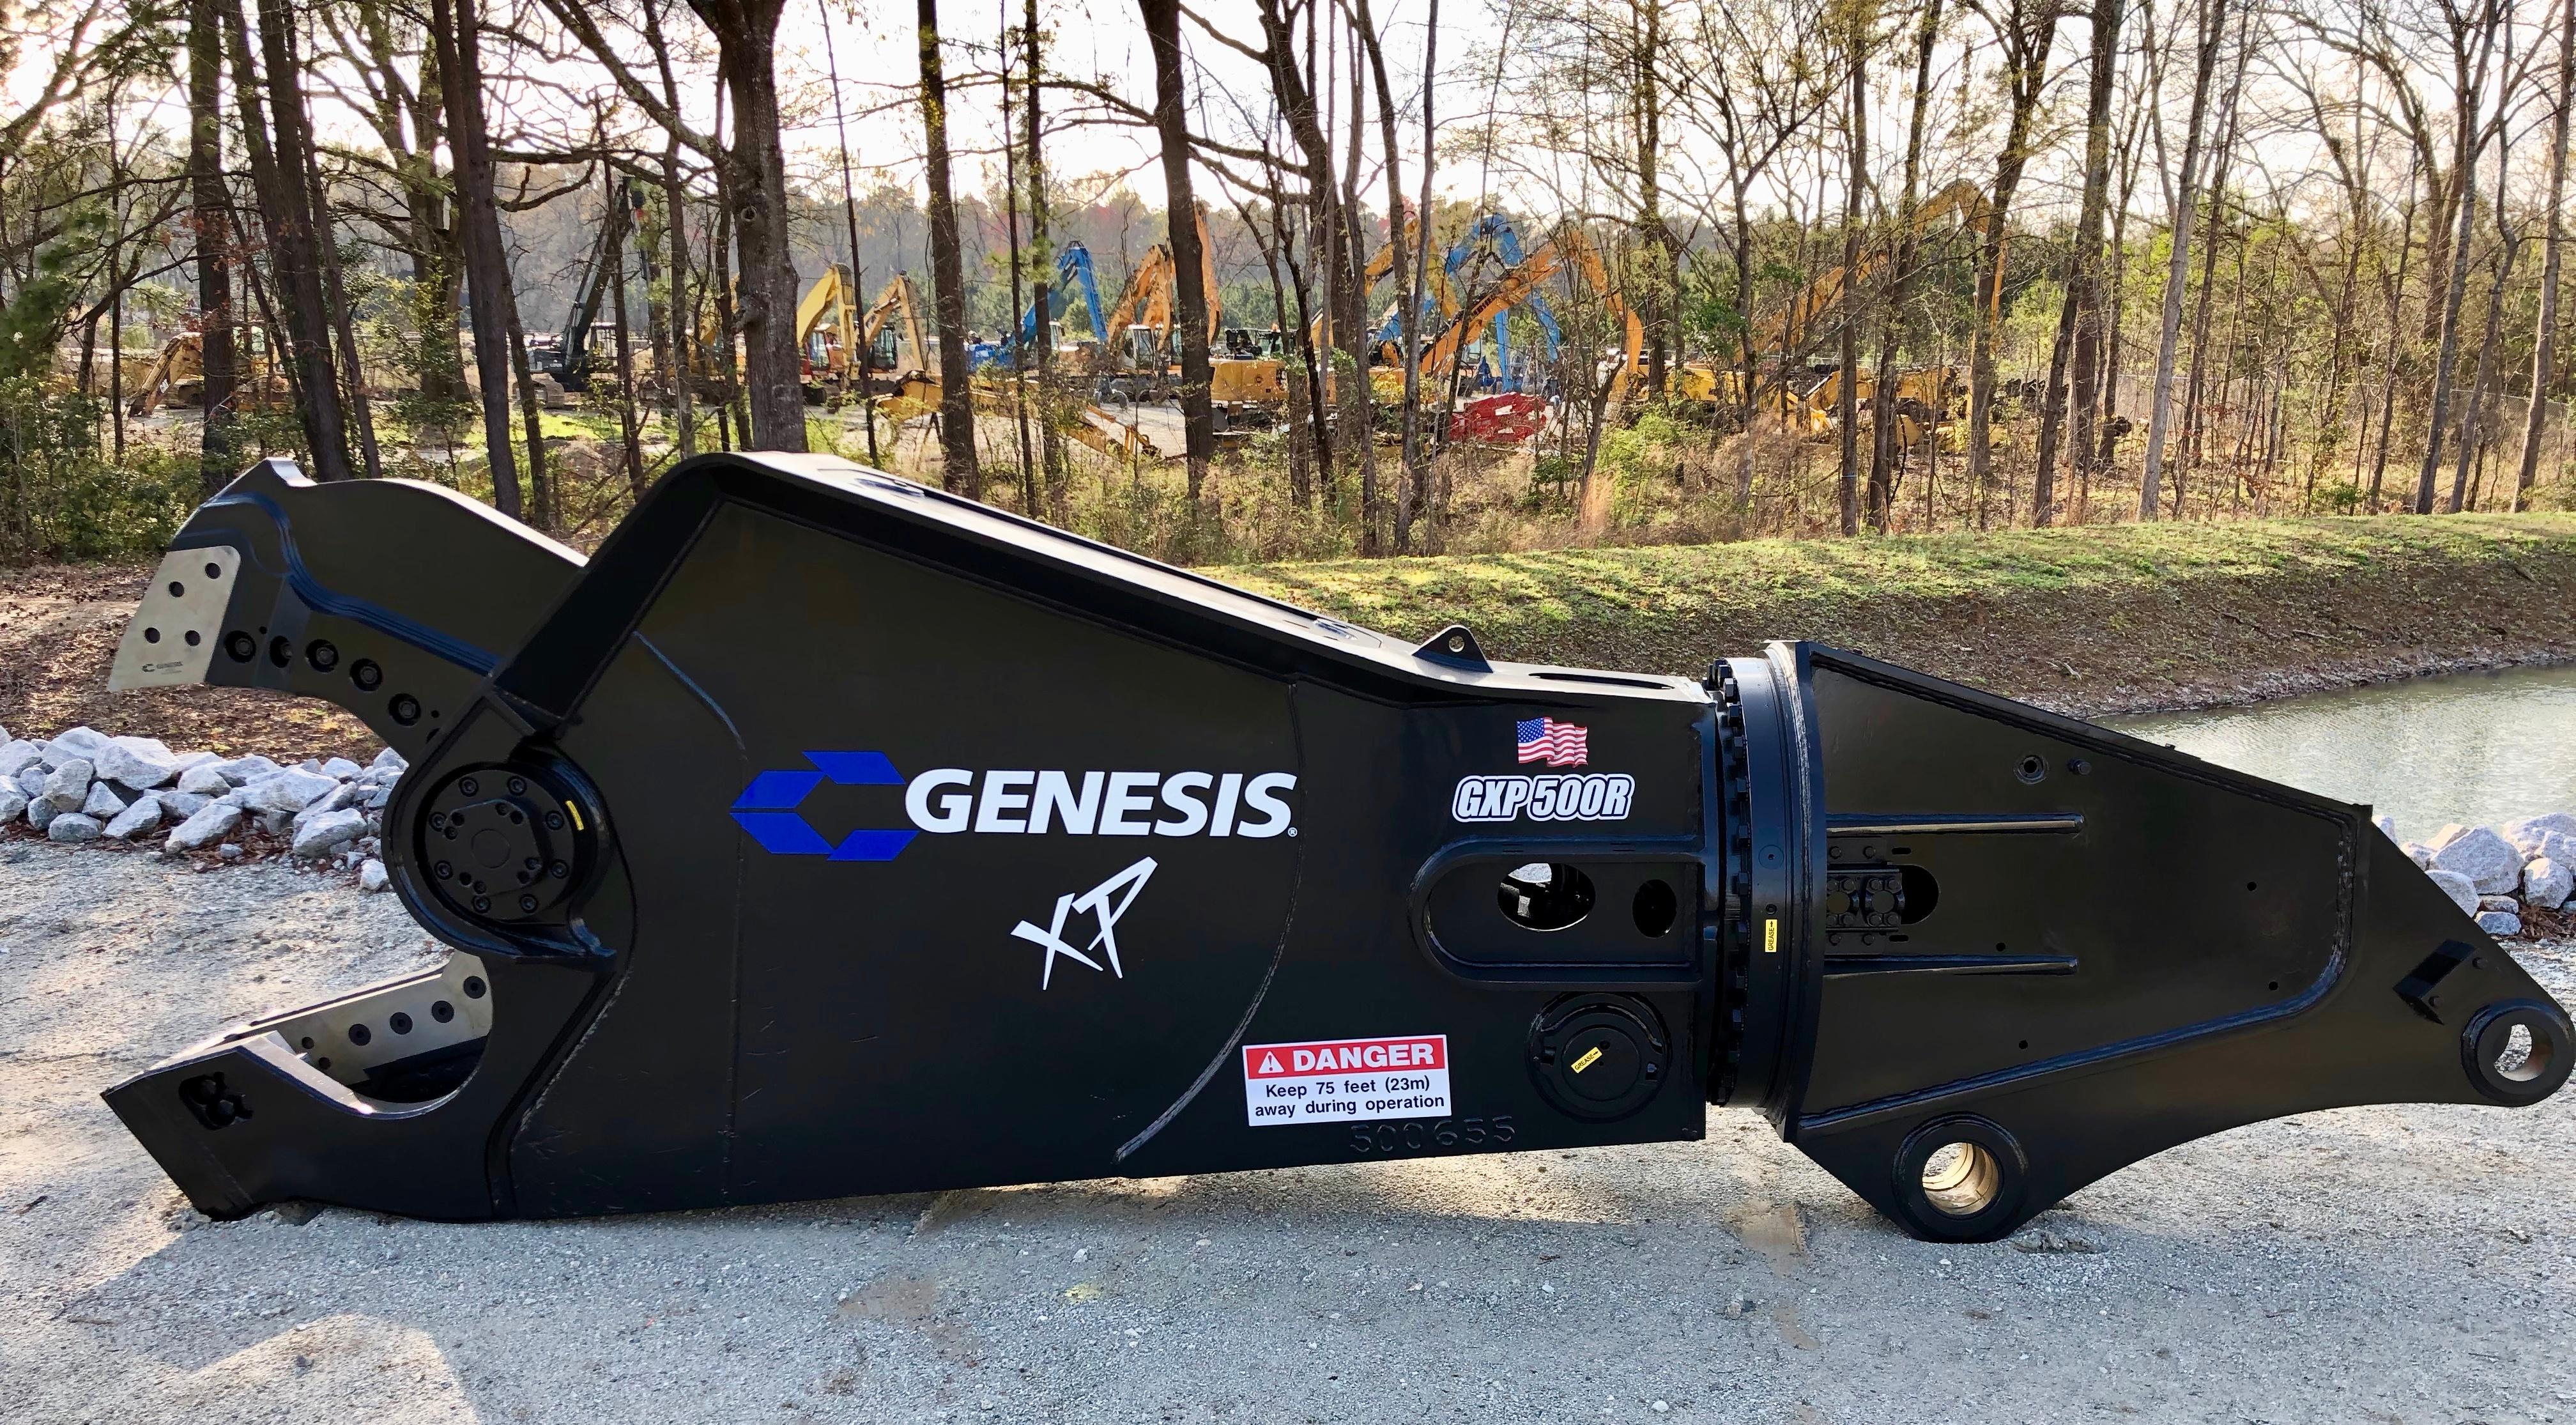 Used  Genesis GXP500R For Sale